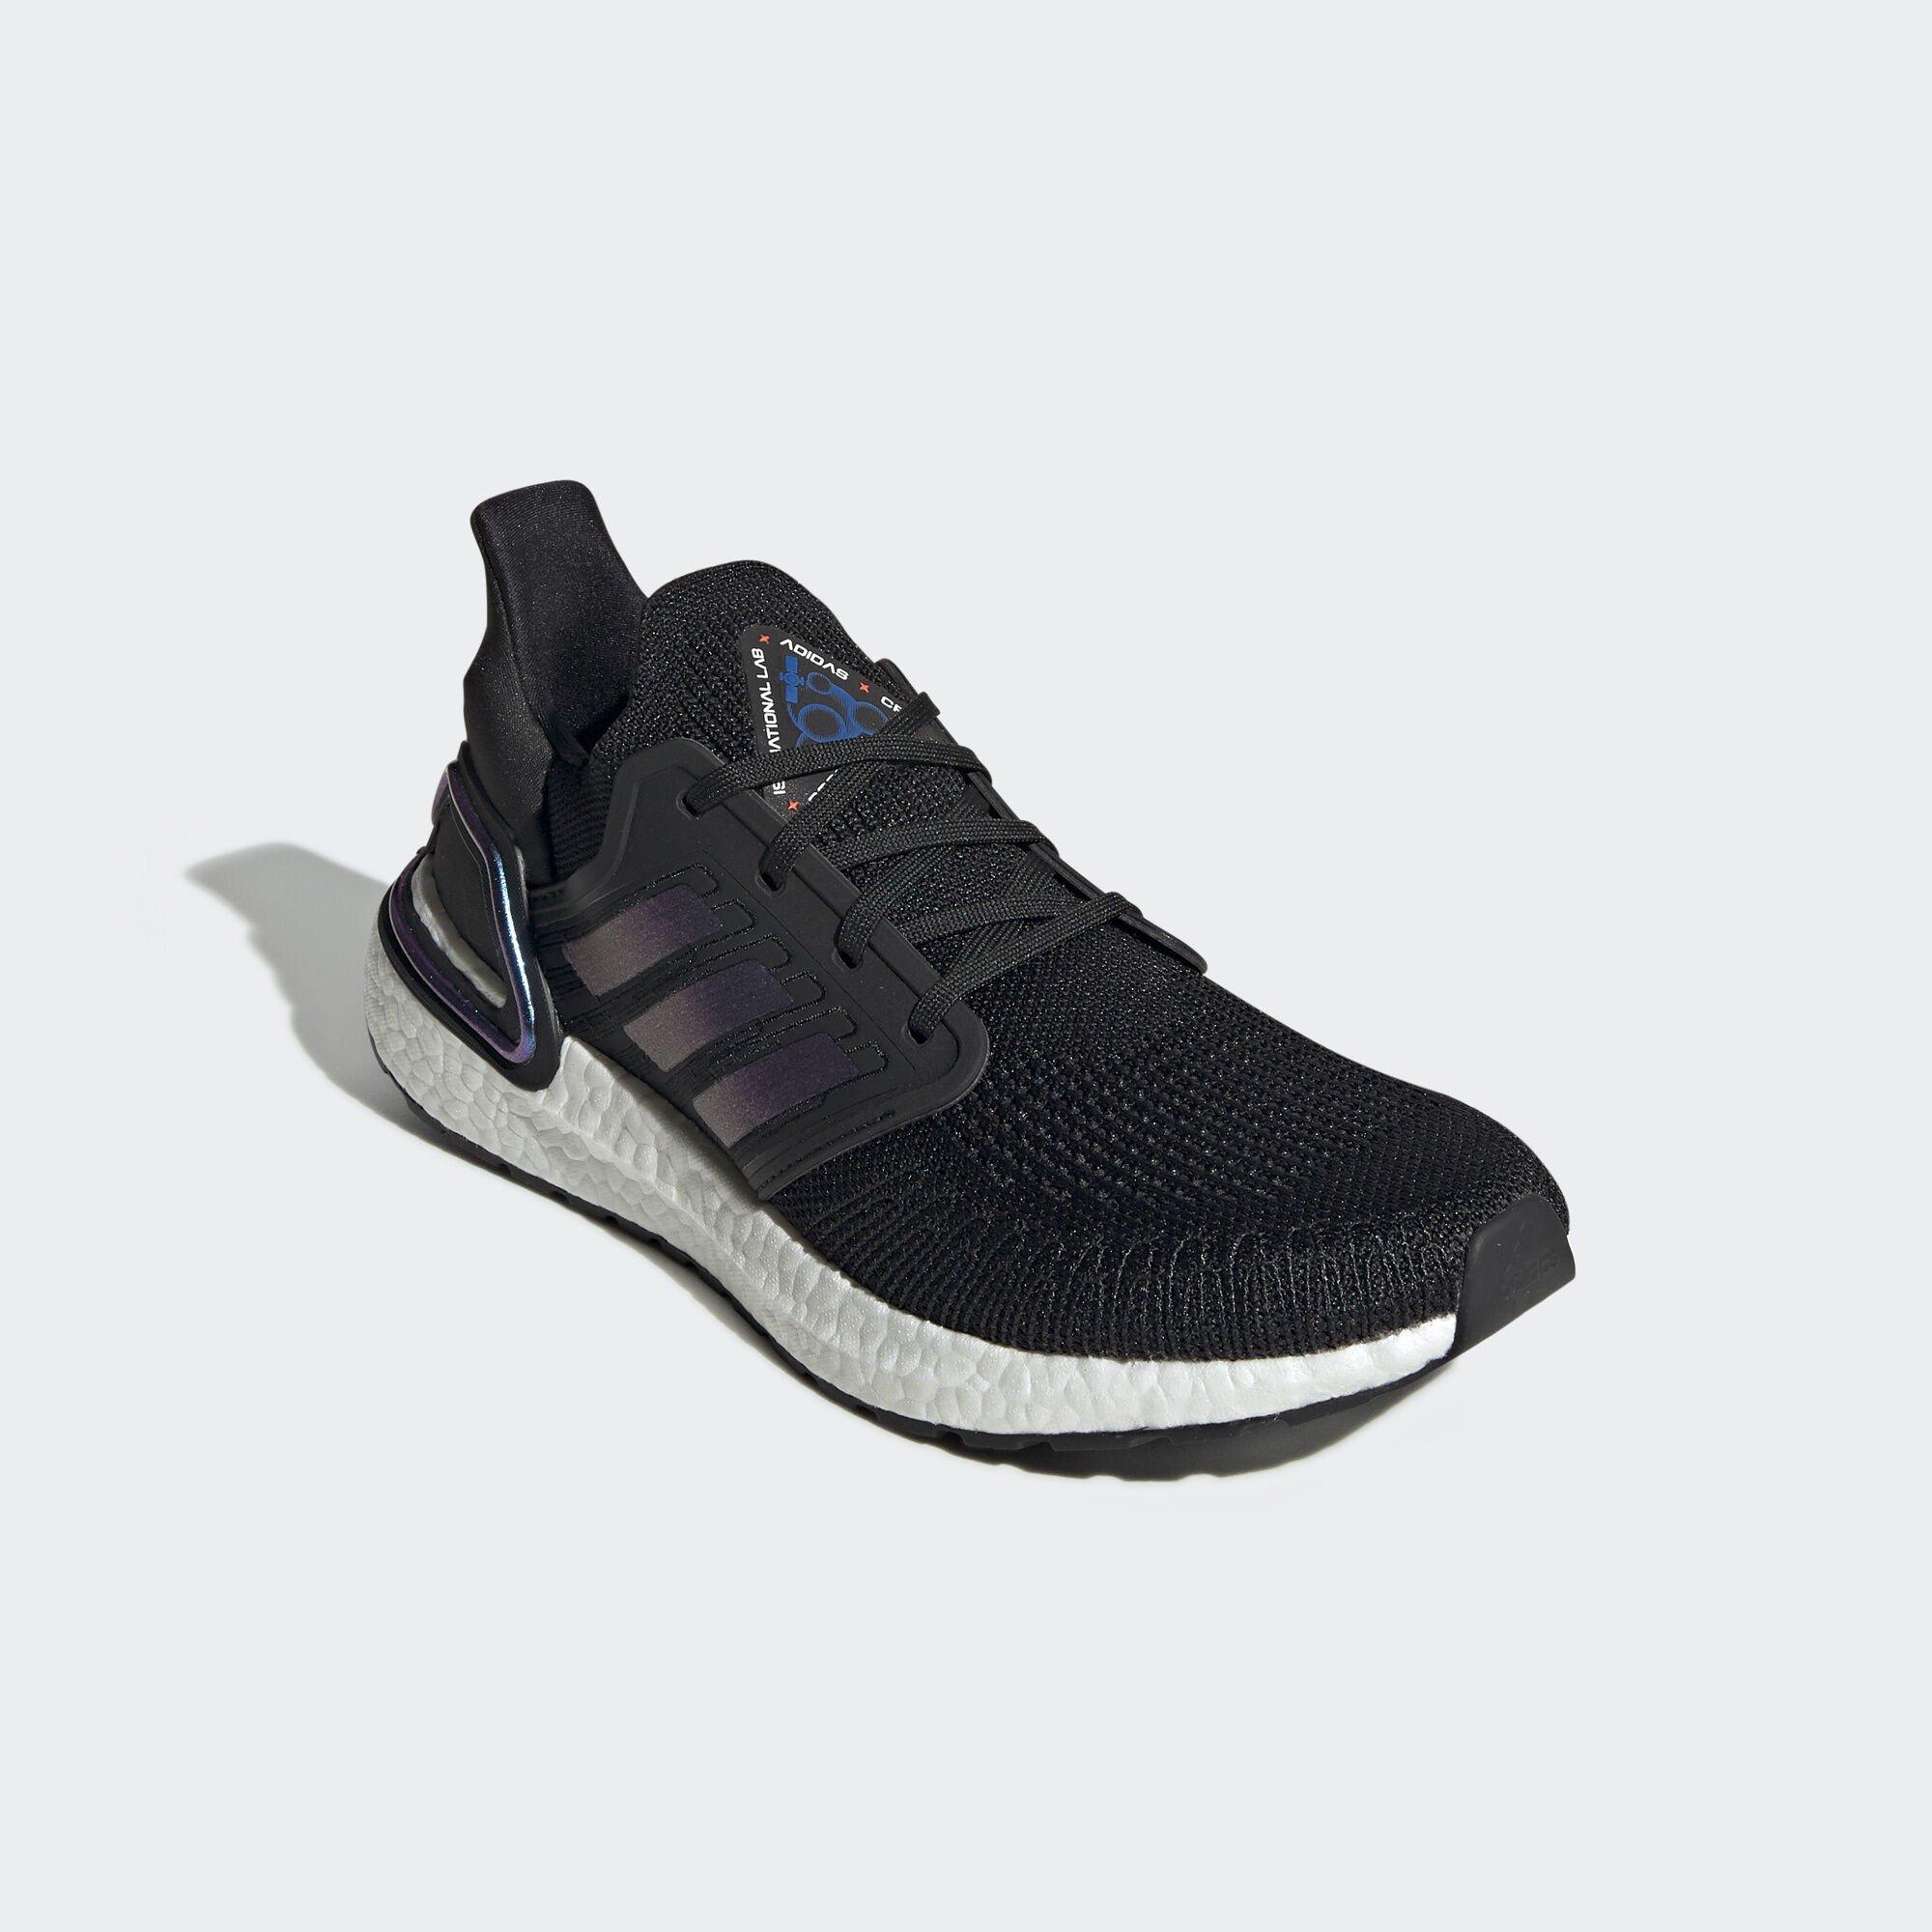 adidas Ultra Boost 2020 ISS US National Lab Core Black Blue Violet (EG0692)